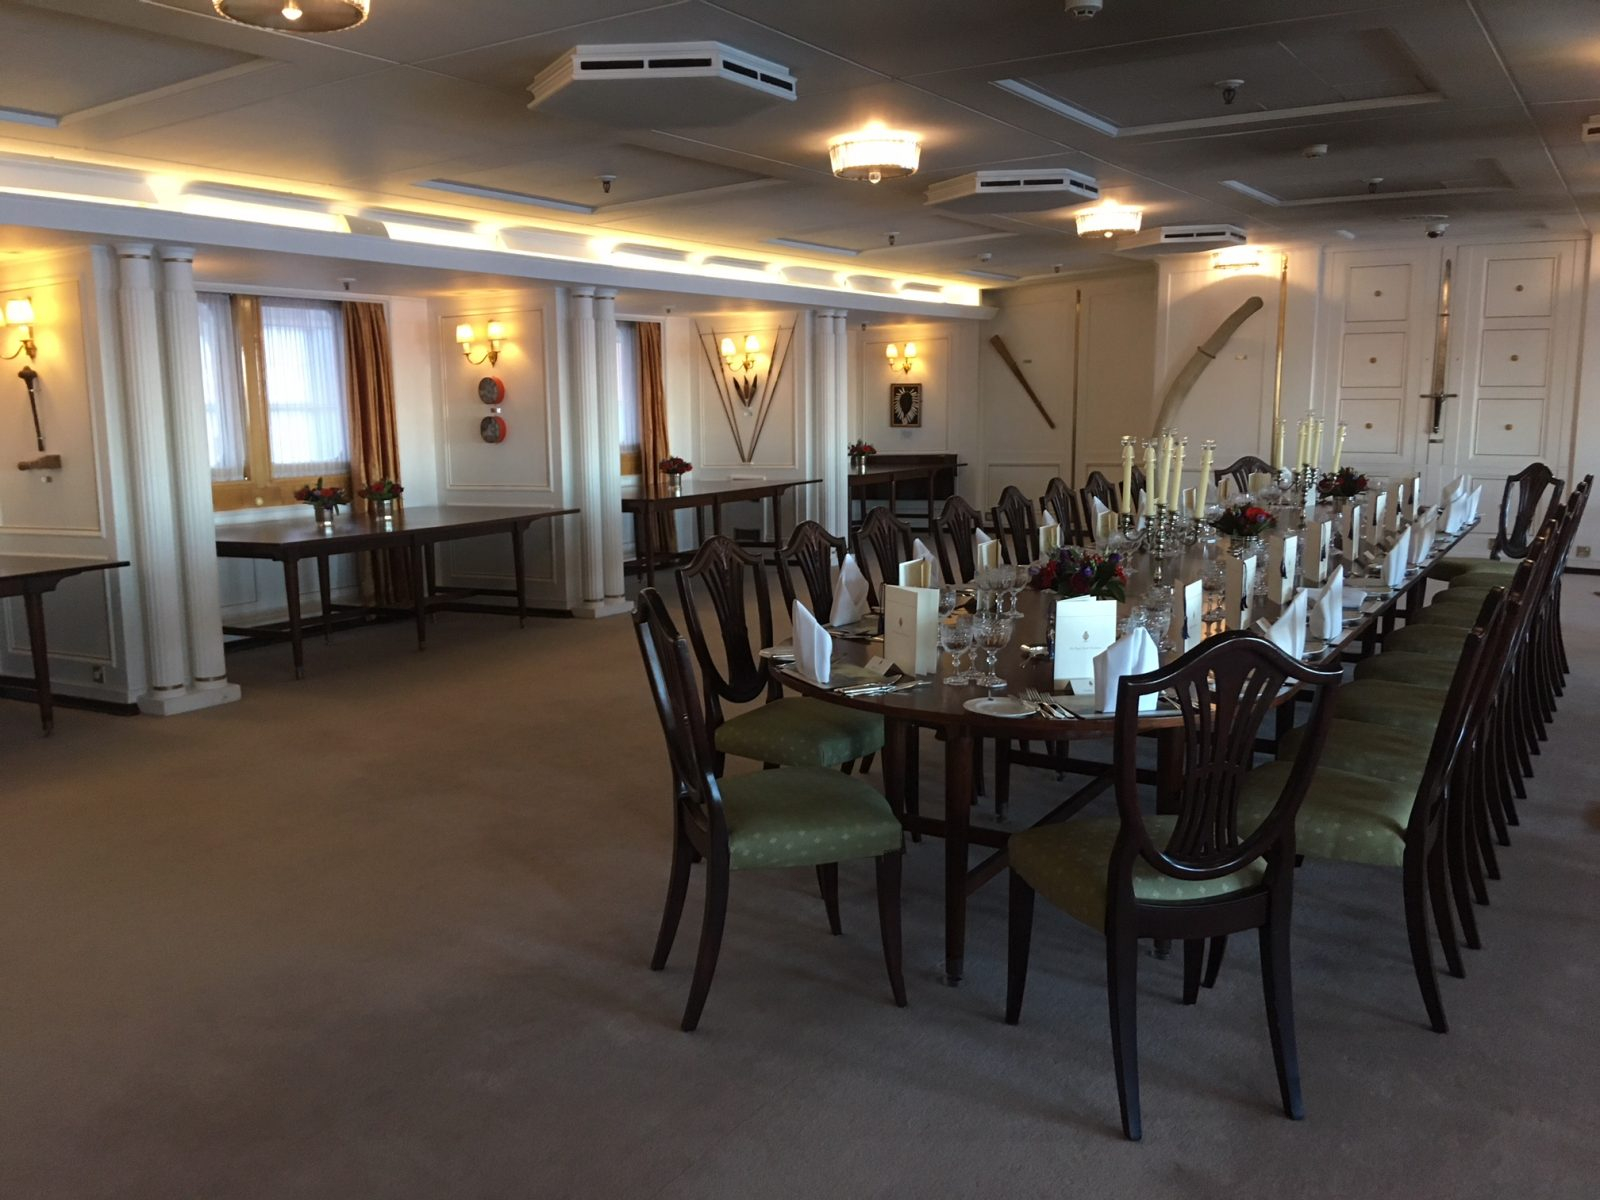 Scotland Corporate Travel Events - Royal Yacht Britannia, Edinburgh